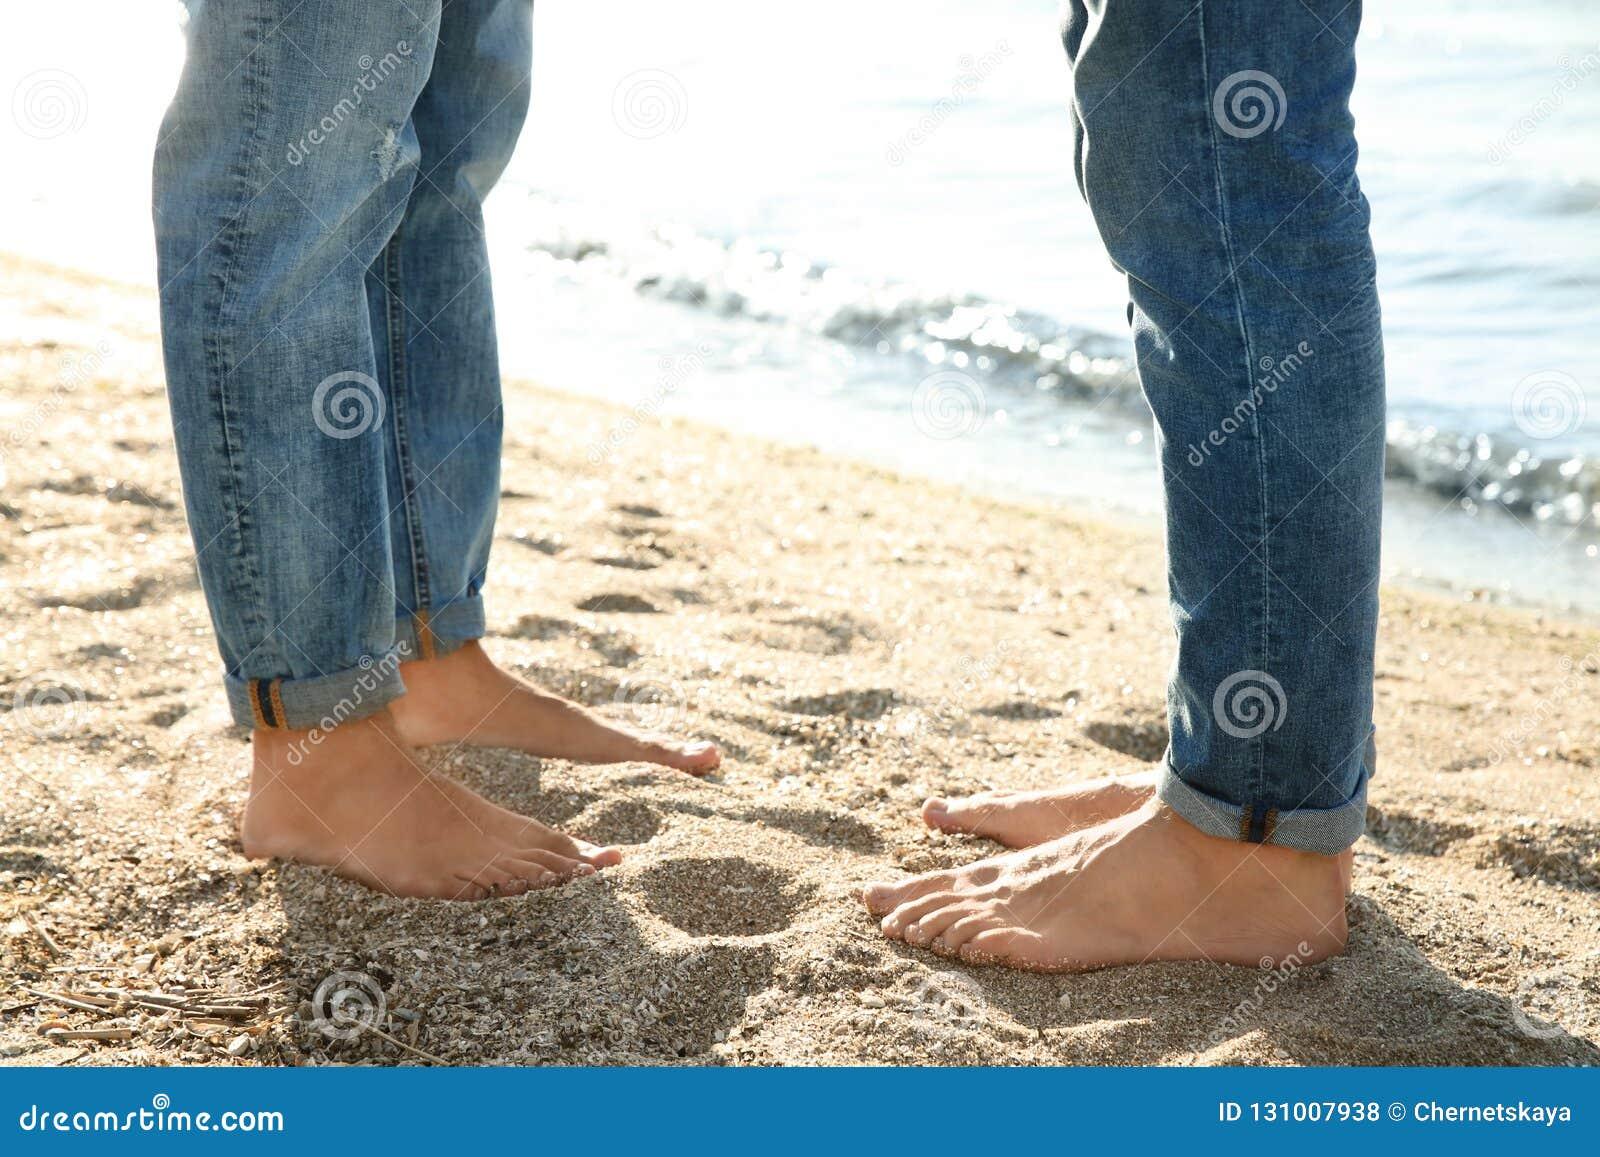 Barefoot gay